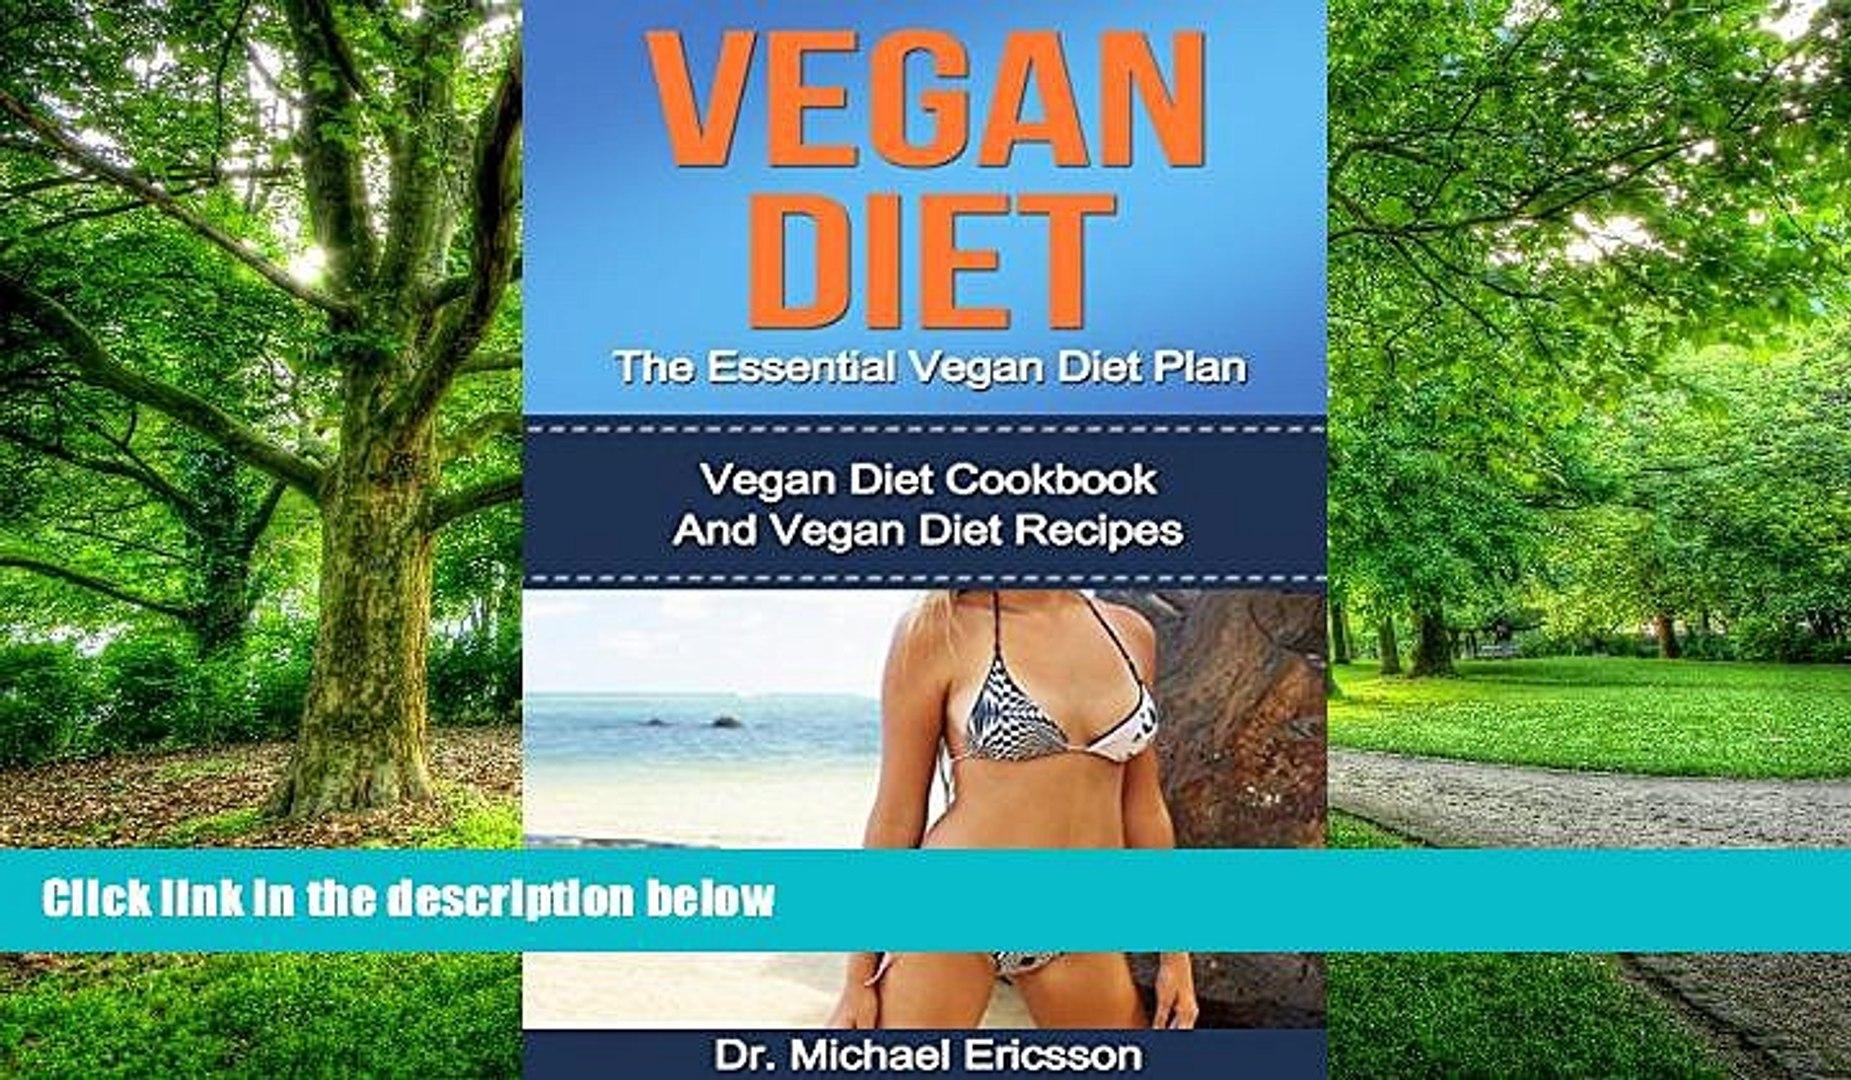 Big Deals  VEGAN DIET: The Essential Vegan Diet Plan: Vegan Diet Cookbook And Vegan Diet Recipes